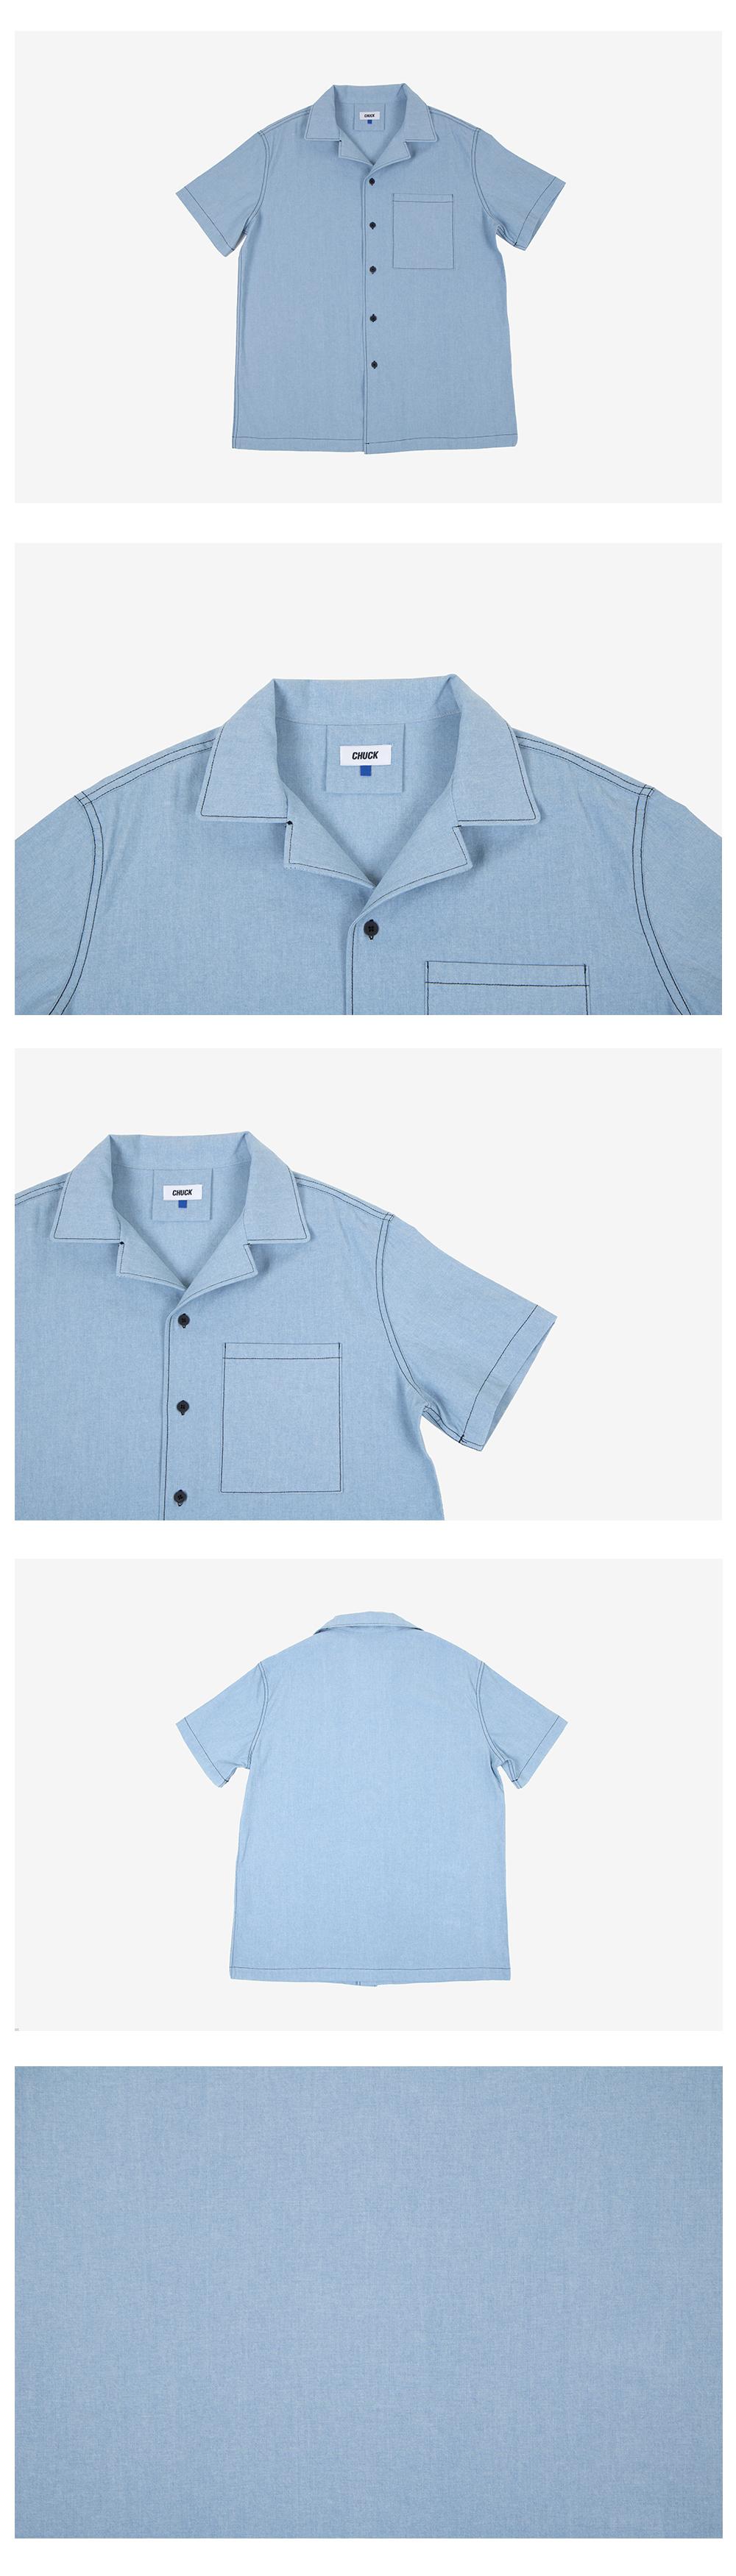 Chuck denim half sleeve shirt light denim 69 000 for Denim half sleeve shirt